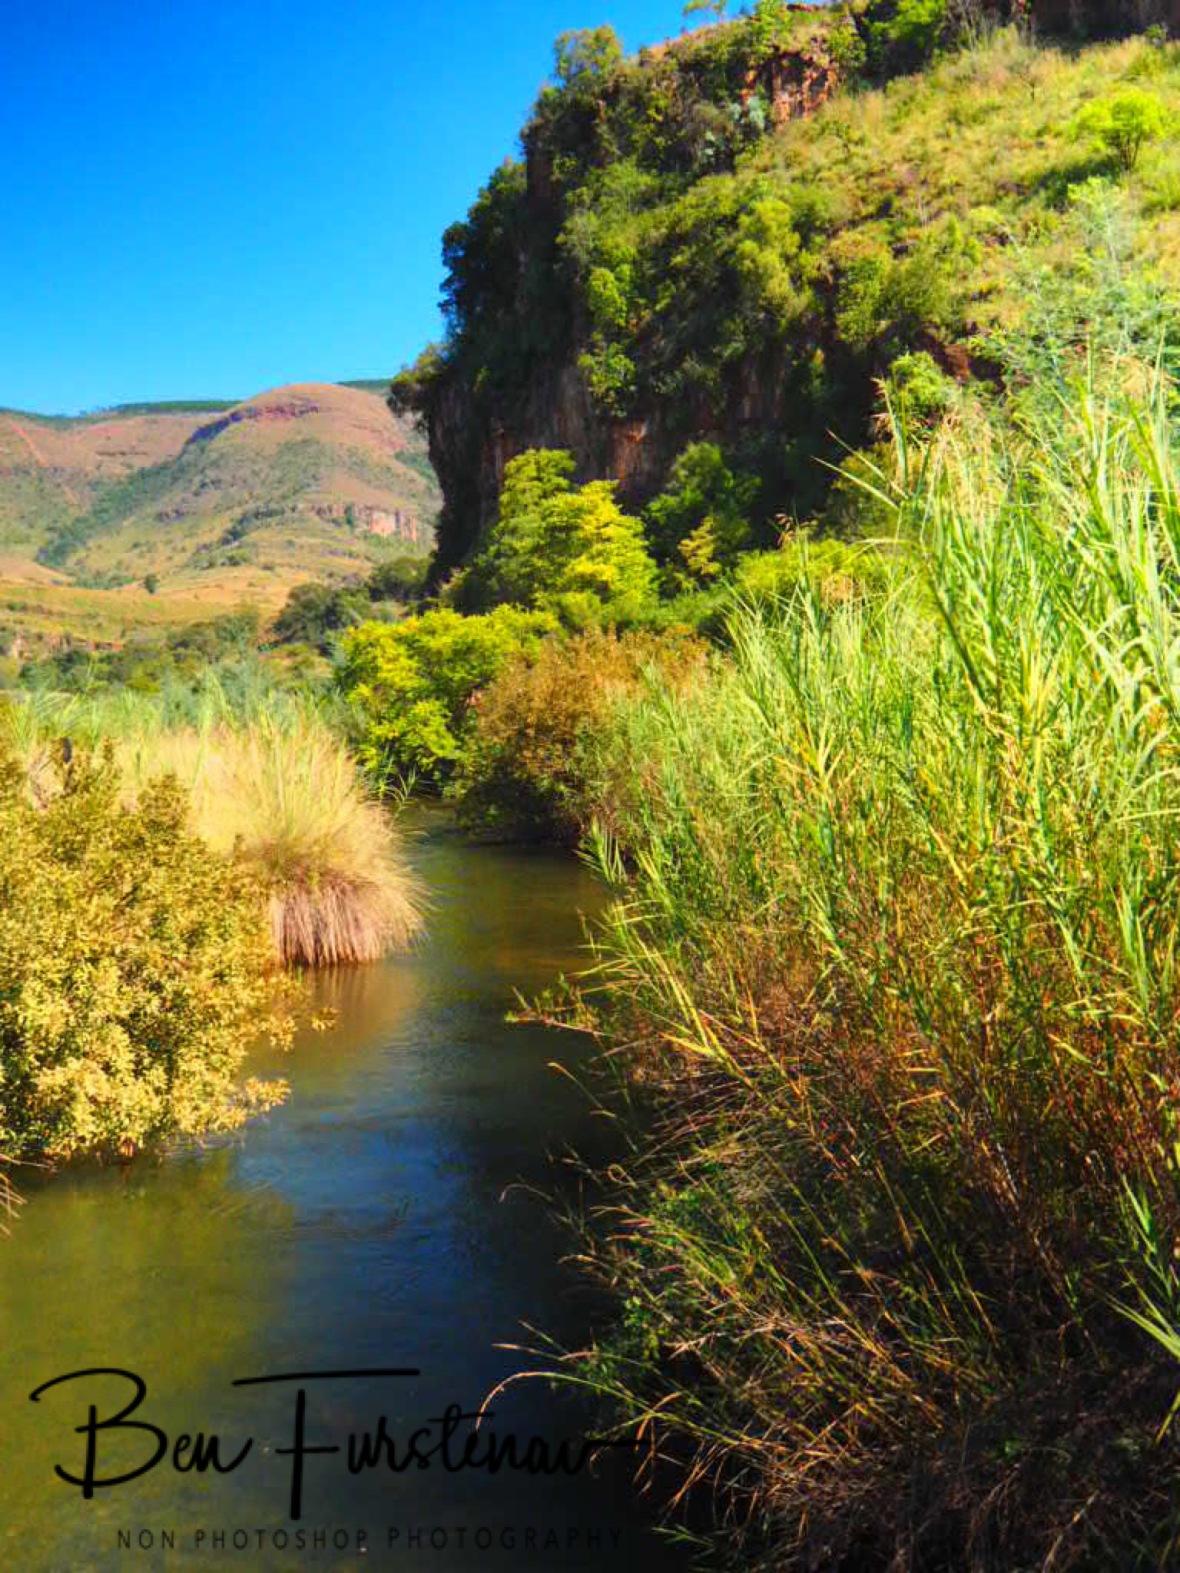 Stunning scenery, Northern Drakenberg